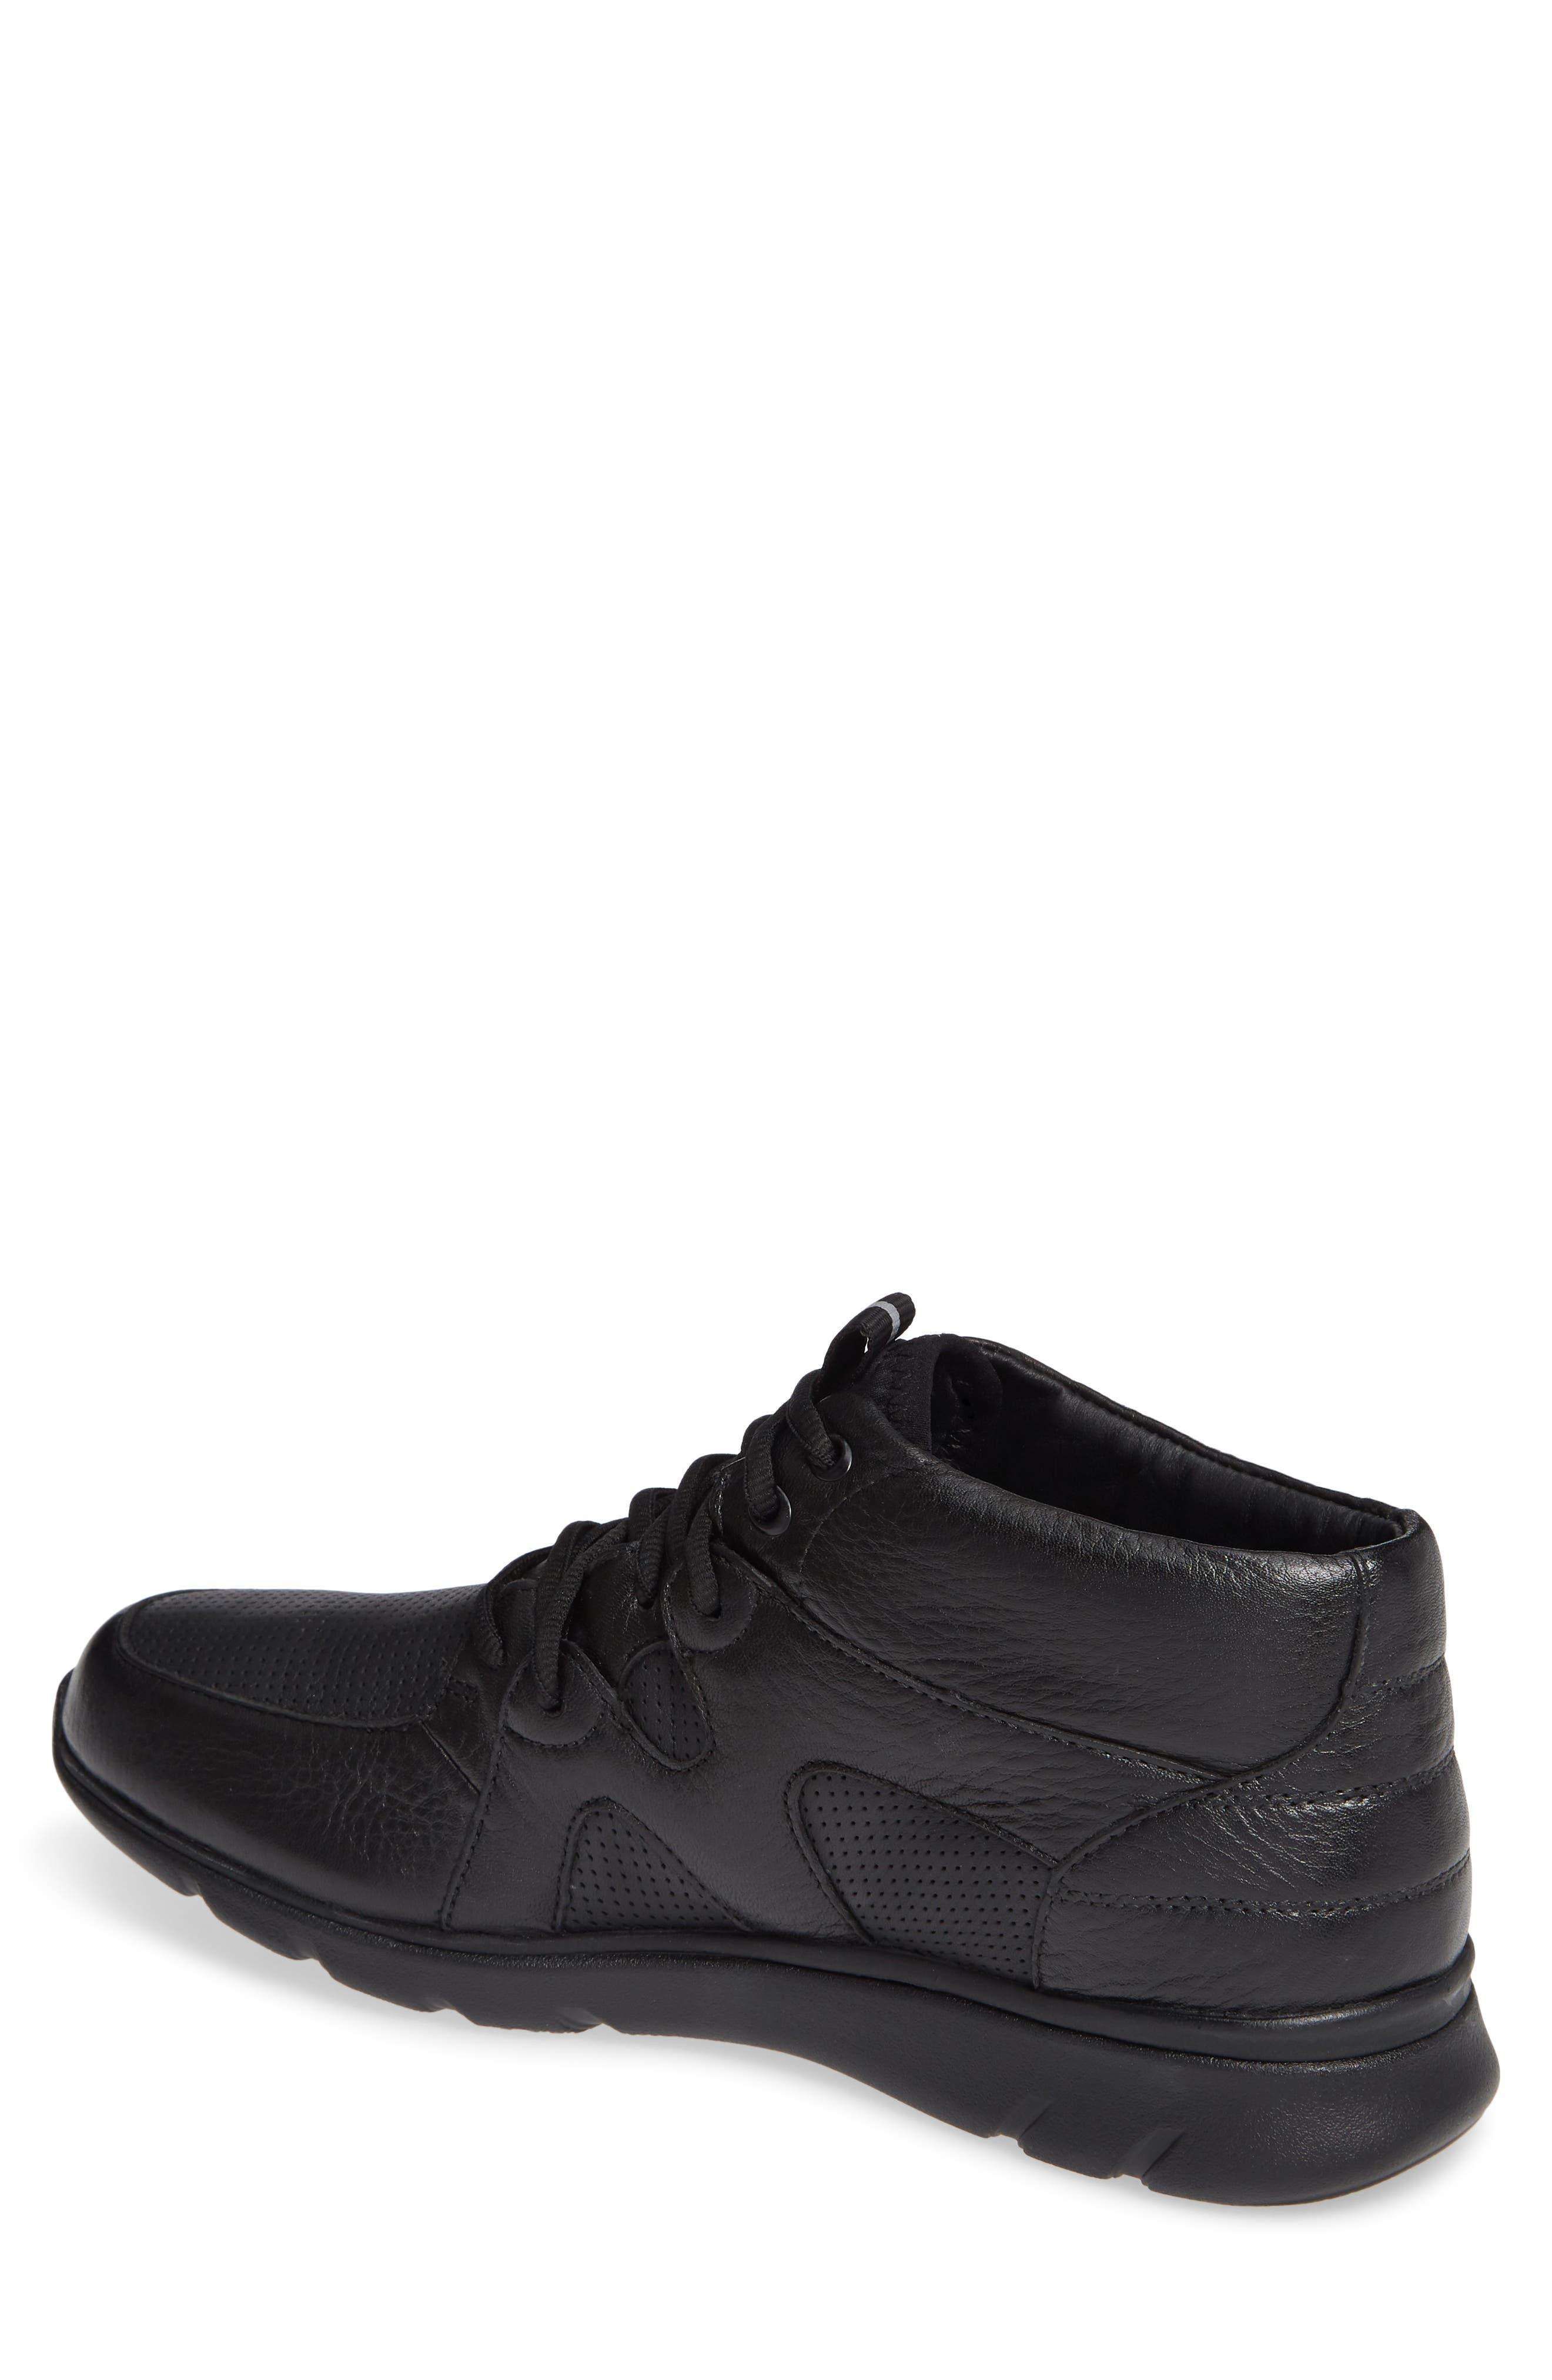 Prentiss Waterproof Sneaker,                             Alternate thumbnail 2, color,                             BLACK LEATHER